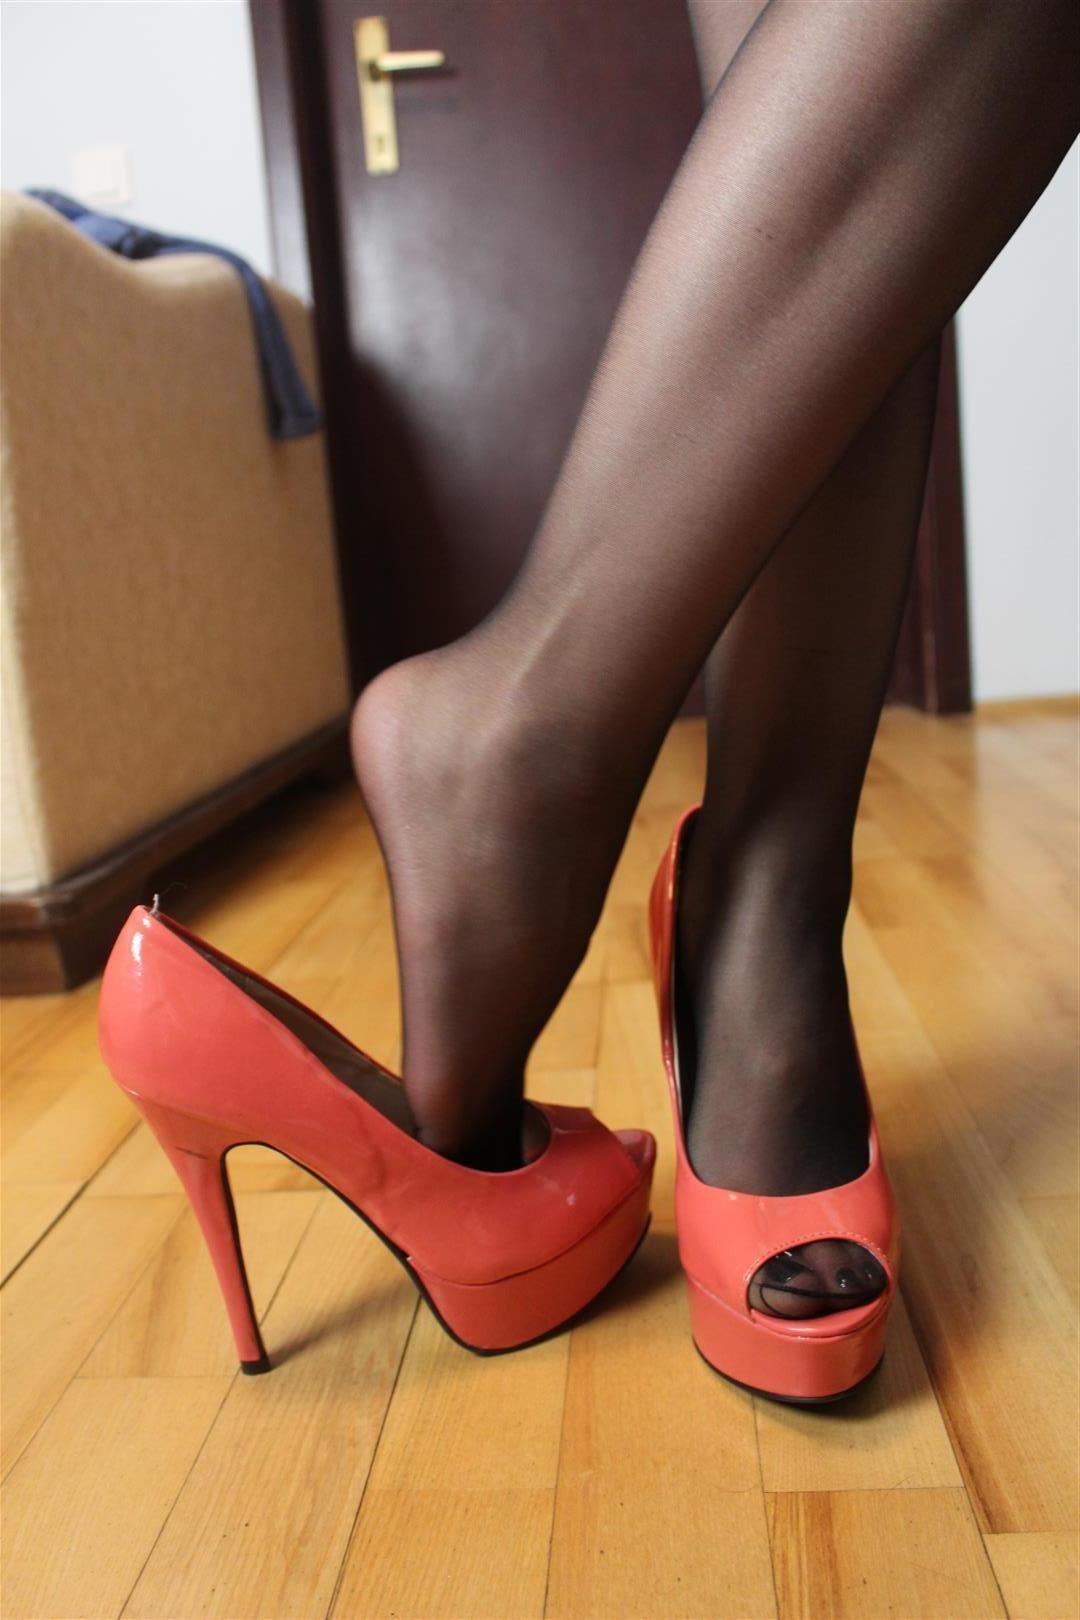 ♤ pantyhose | Nylon Feet | Pinterest | Sandaletten, Sandalen und Pumps